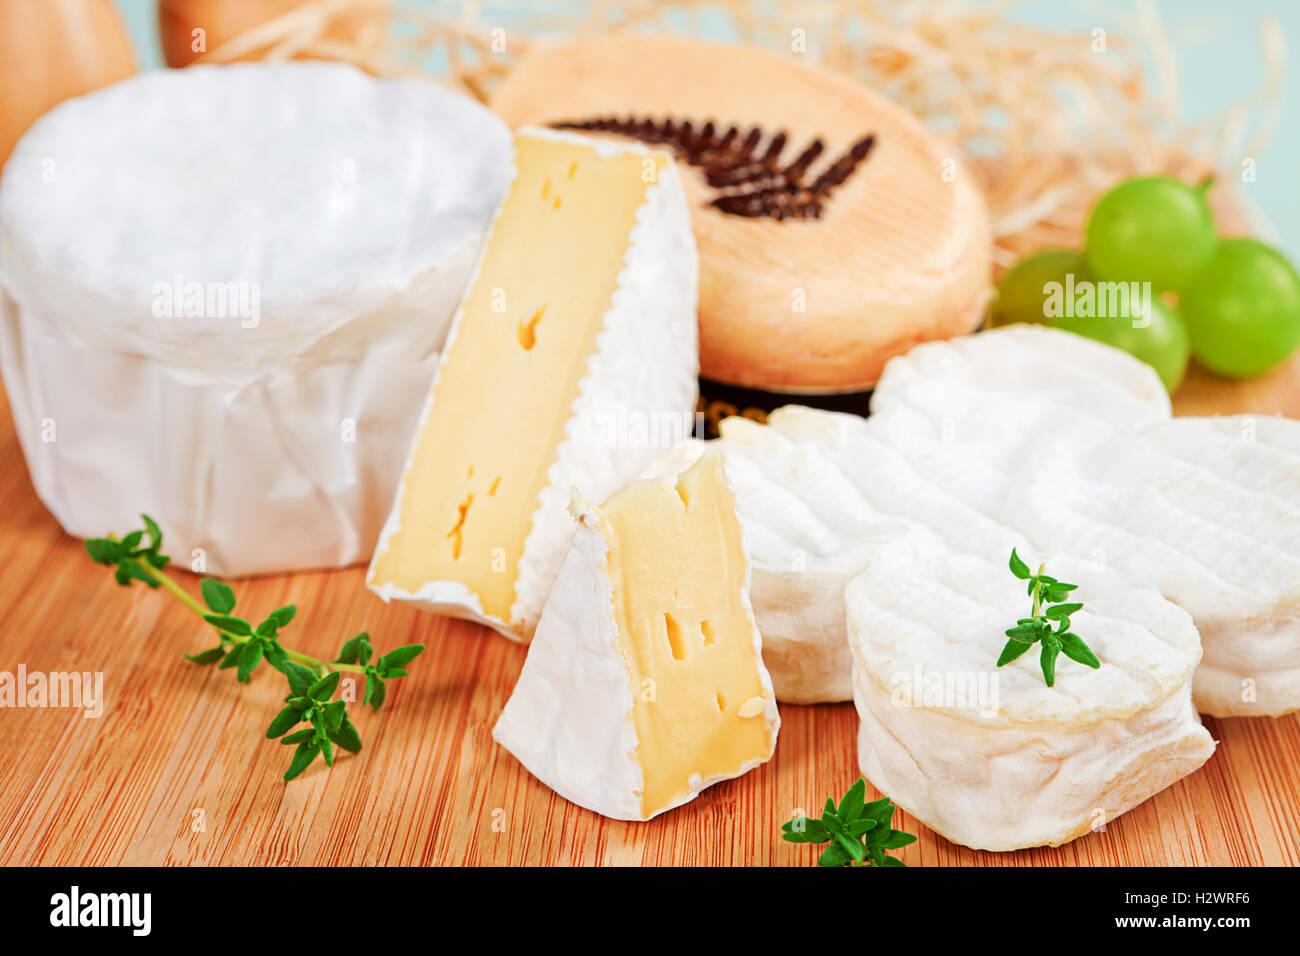 Luxurious cheese still life. - Stock Image